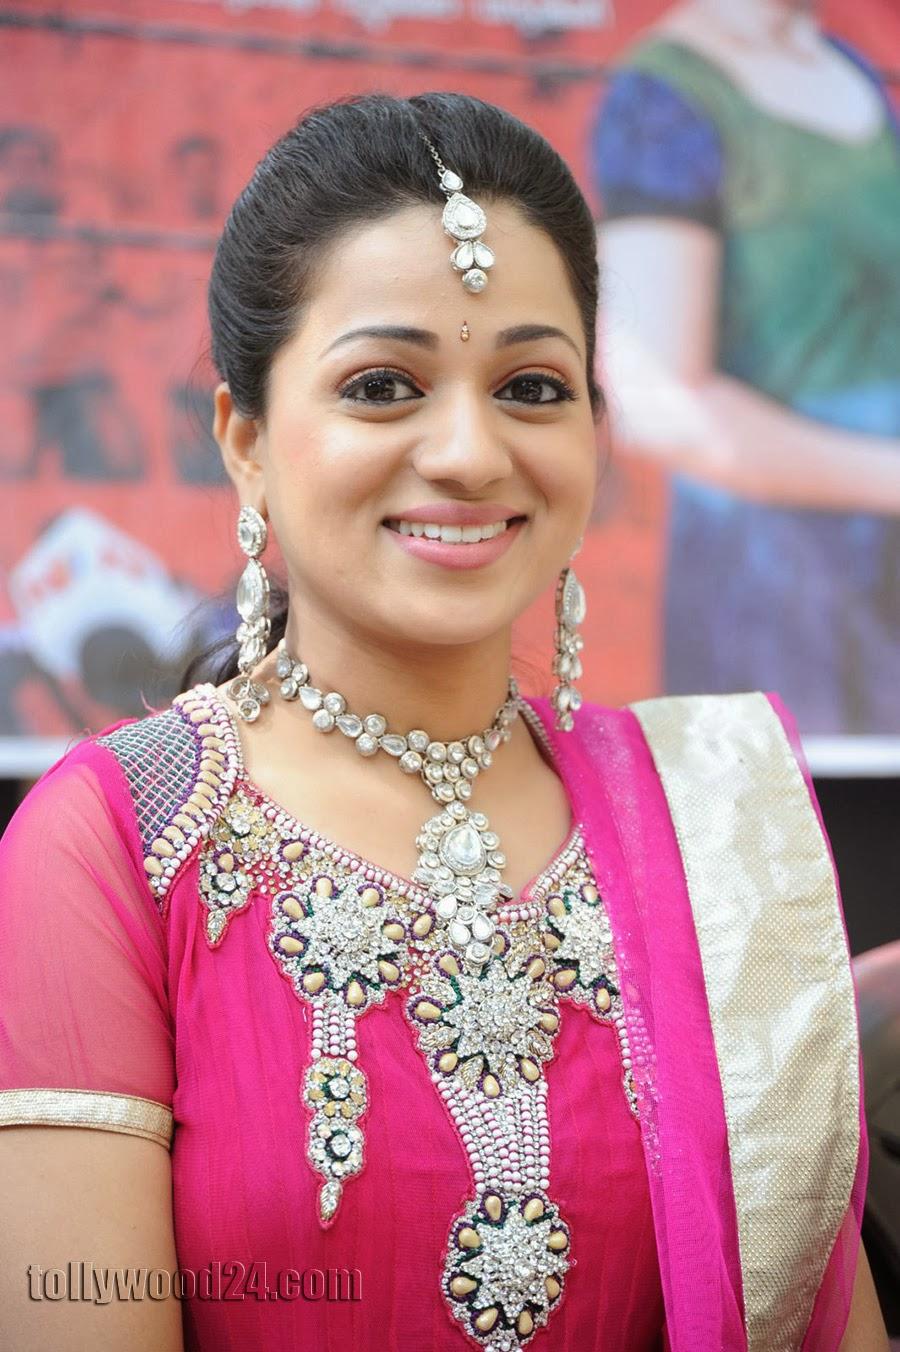 Reshma Photos from Prathighatana Song-HQ-Photo-13